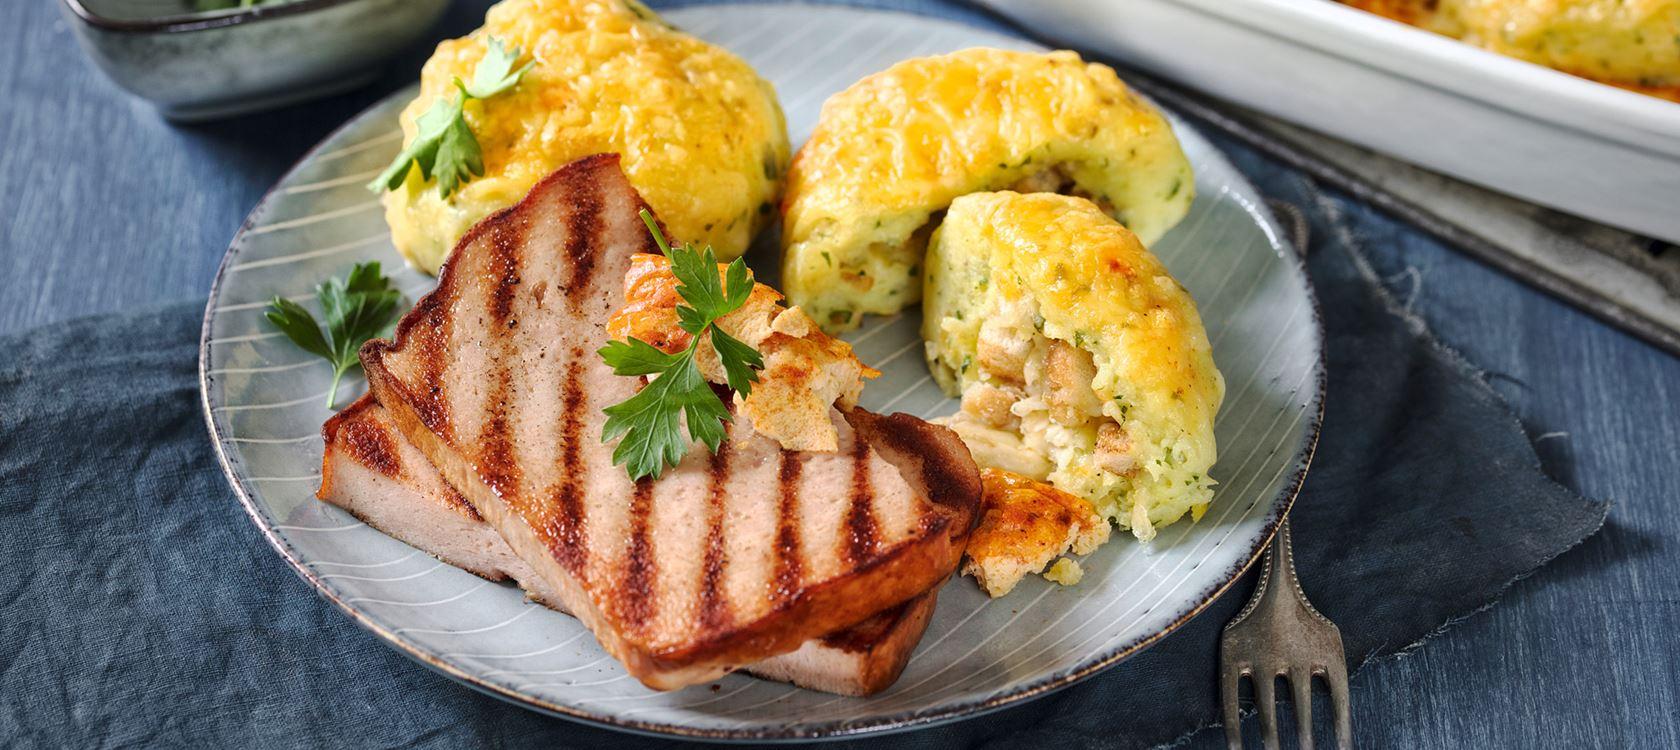 Überbackene Kartoffelknödel mit Leberkäse mit Finello® Ofenkäse